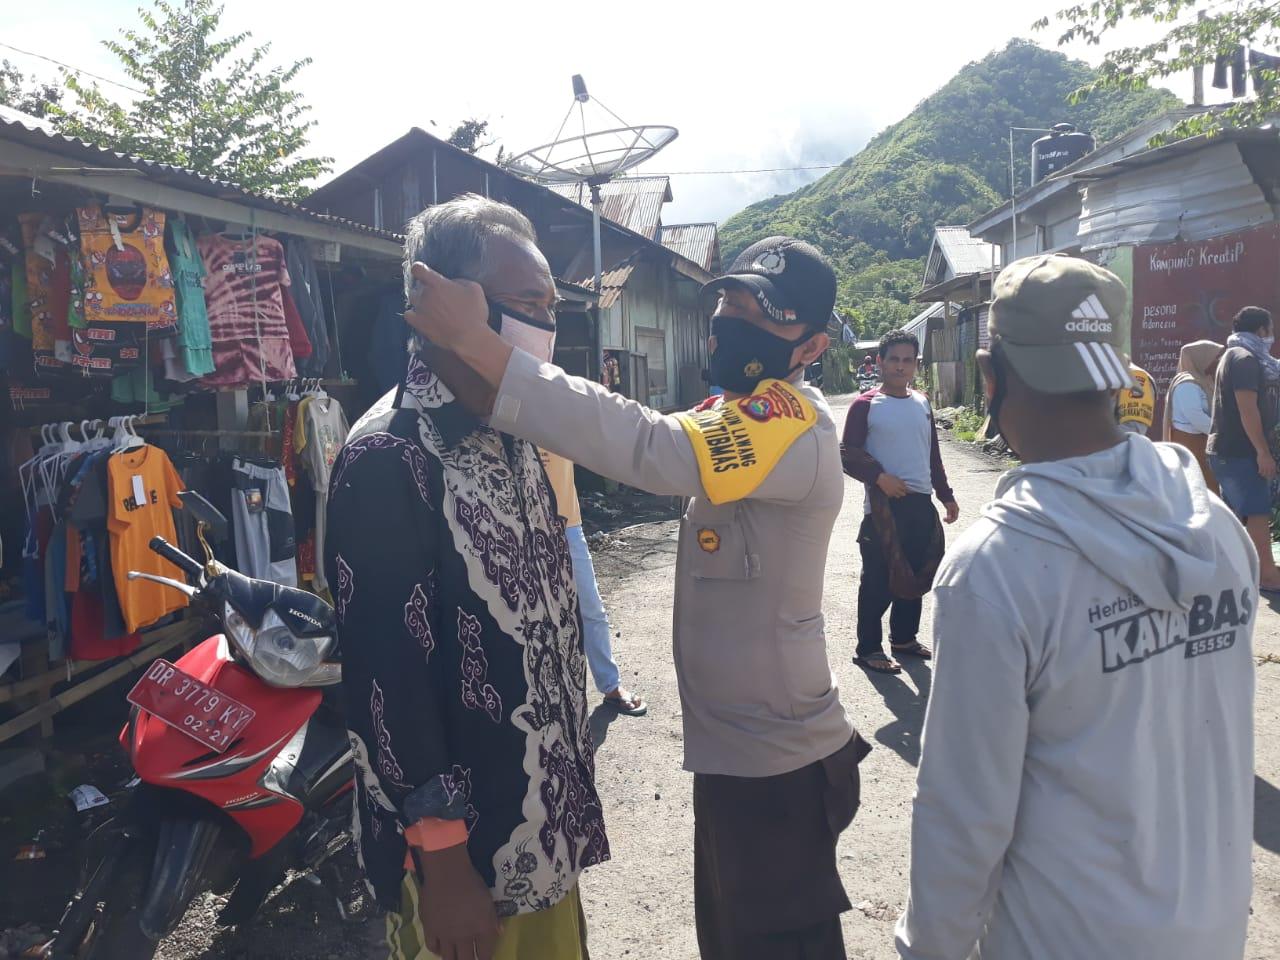 Bersinergi, TNI POLRI dan ASN Bagikan Masker di Pasat Umum Desa Sembalun Lawang